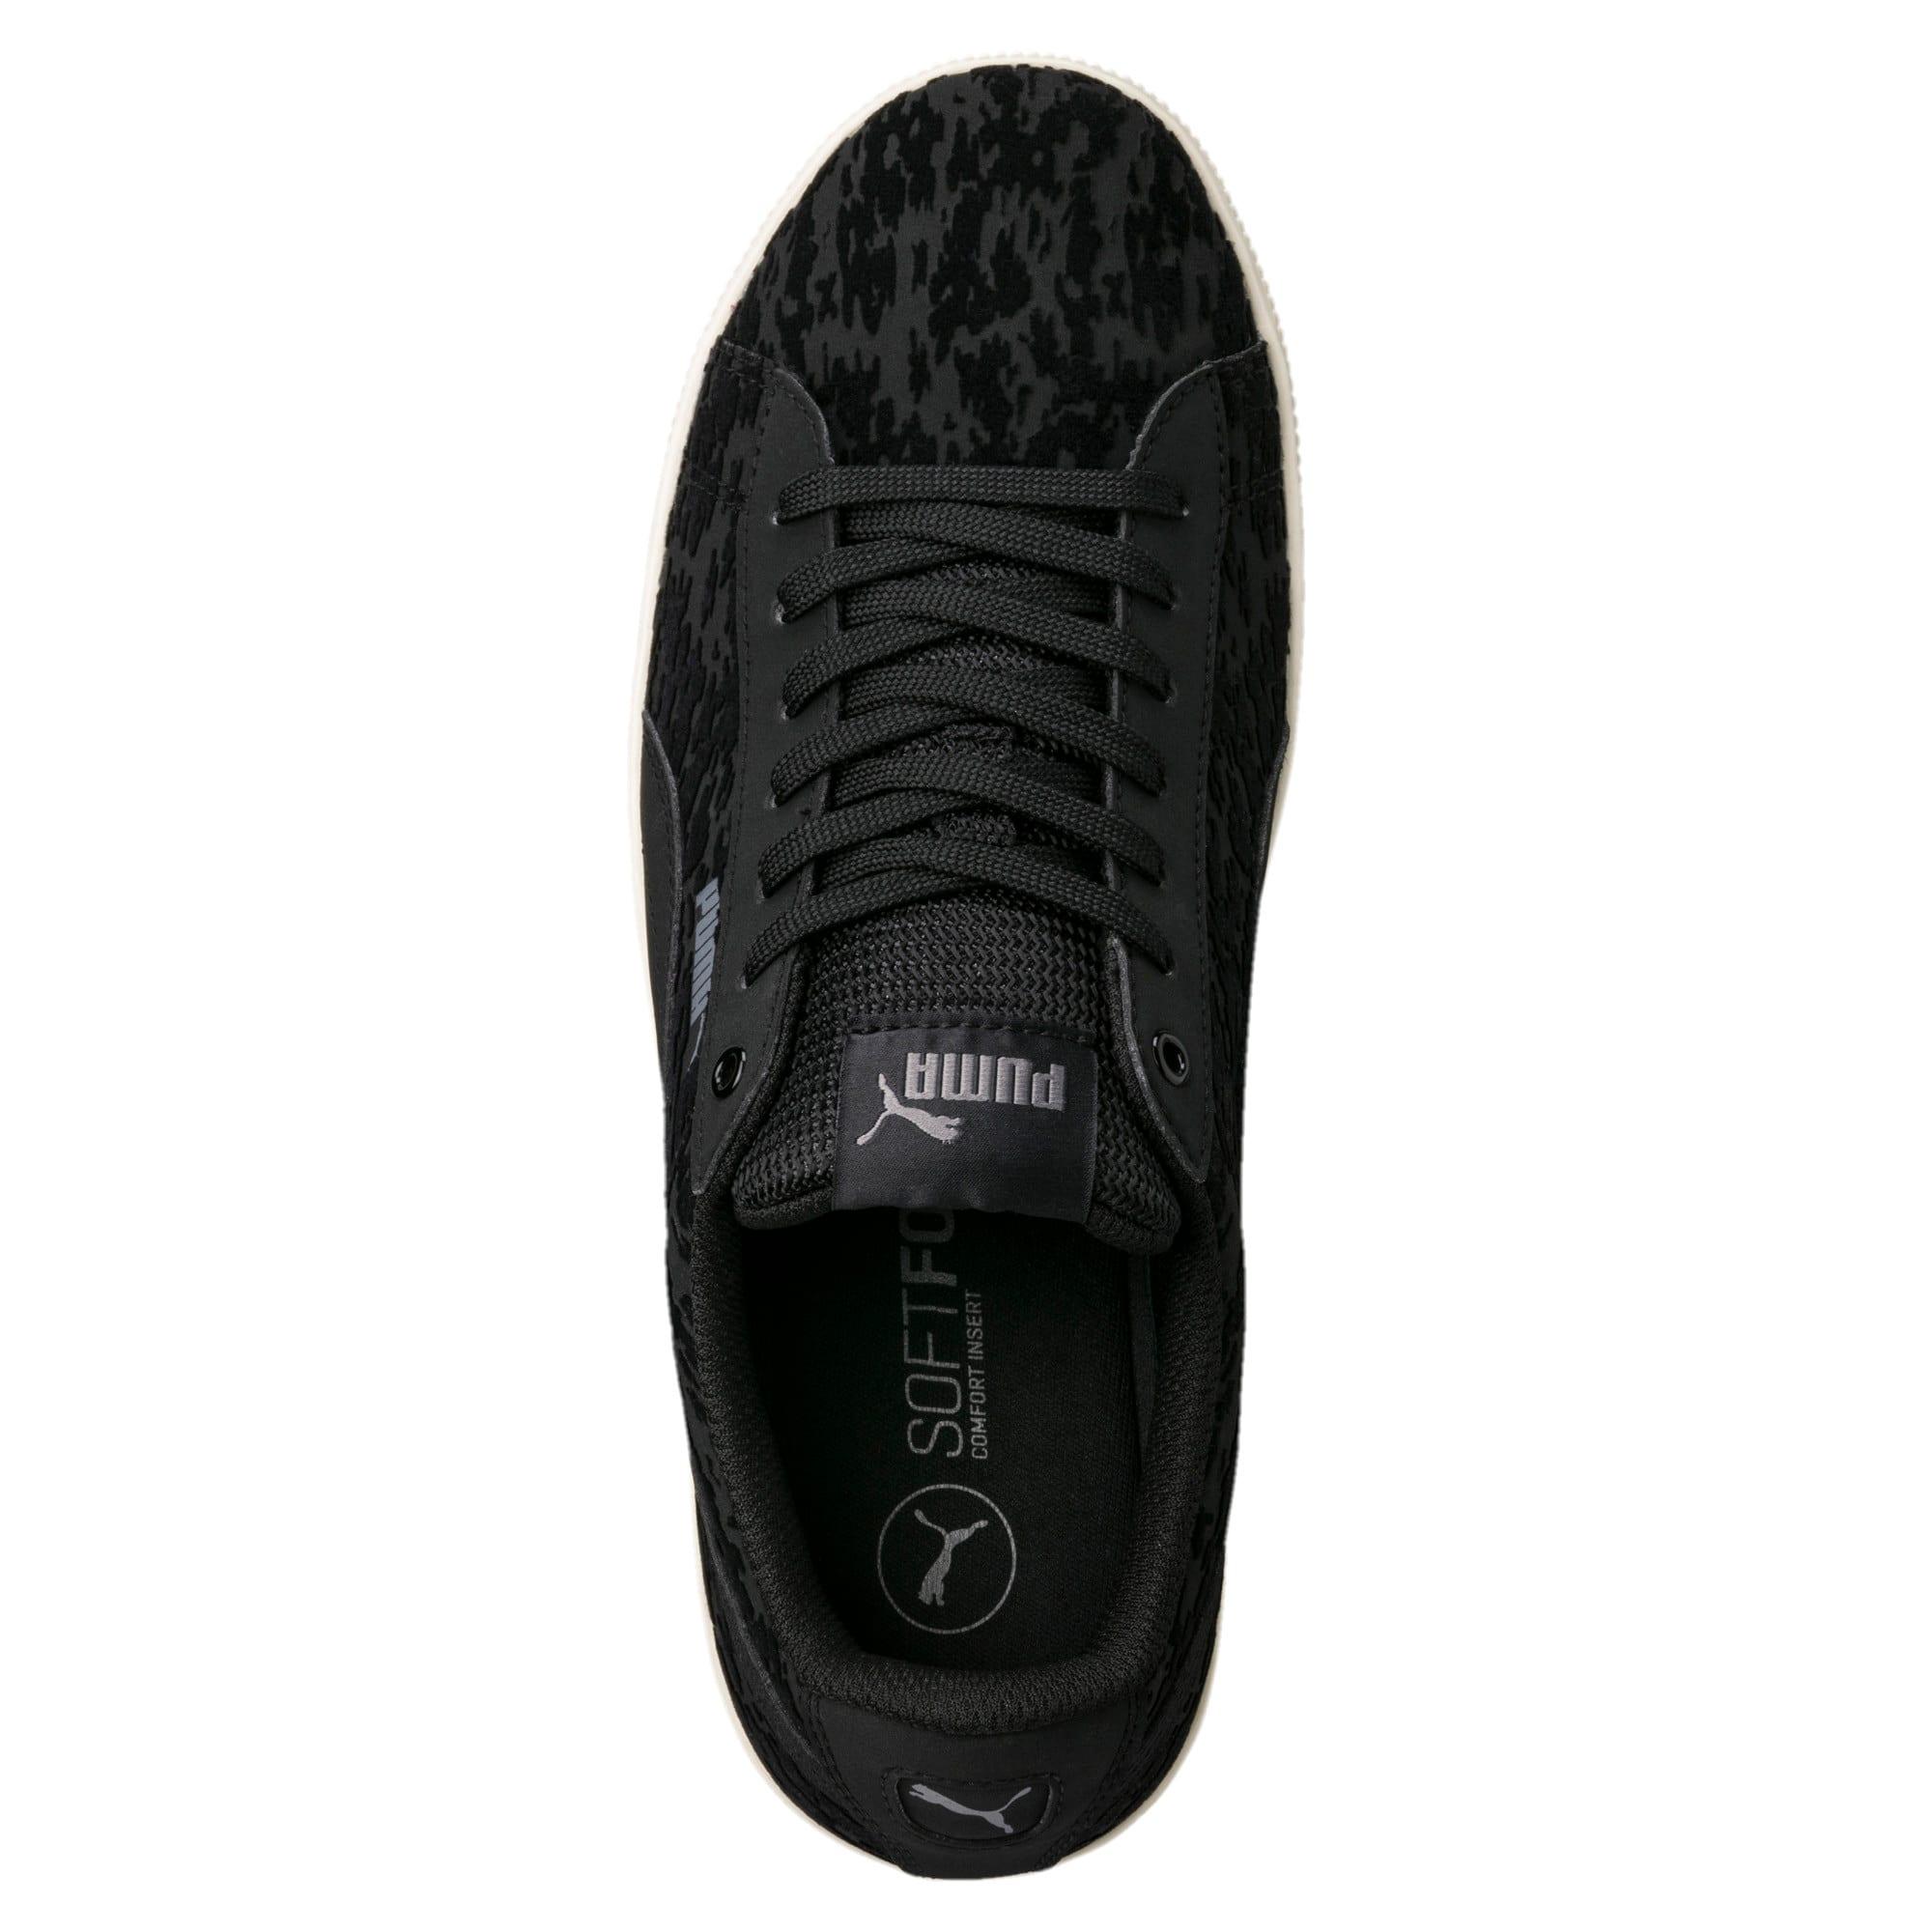 Thumbnail 5 of Vikky Platform Velvet Rope Women's Sneakers, Puma Black-Puma Black, medium